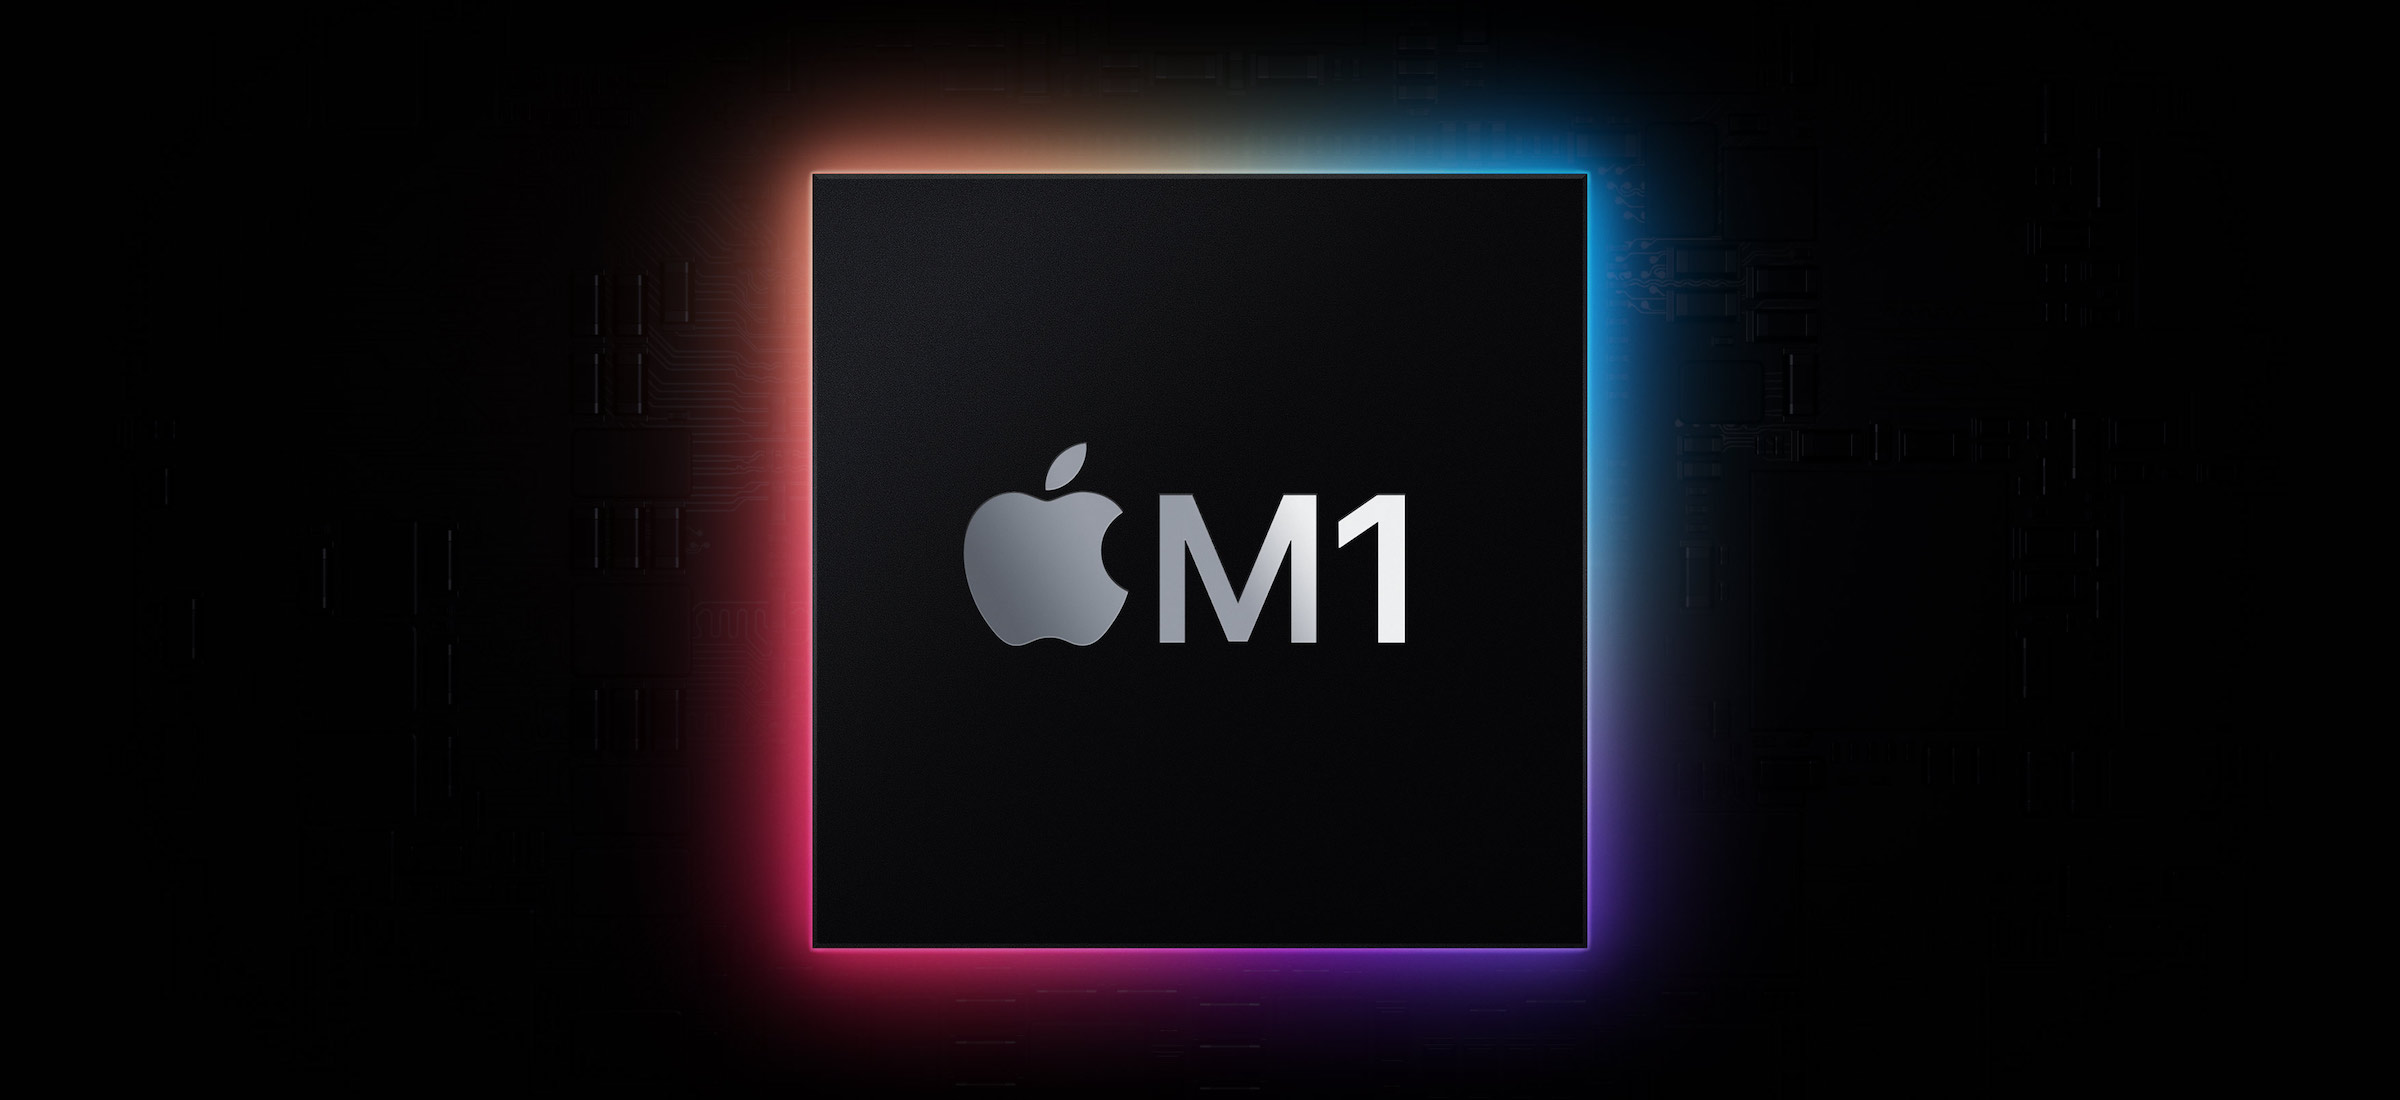 apple m1 macbook air 2020 benchmark